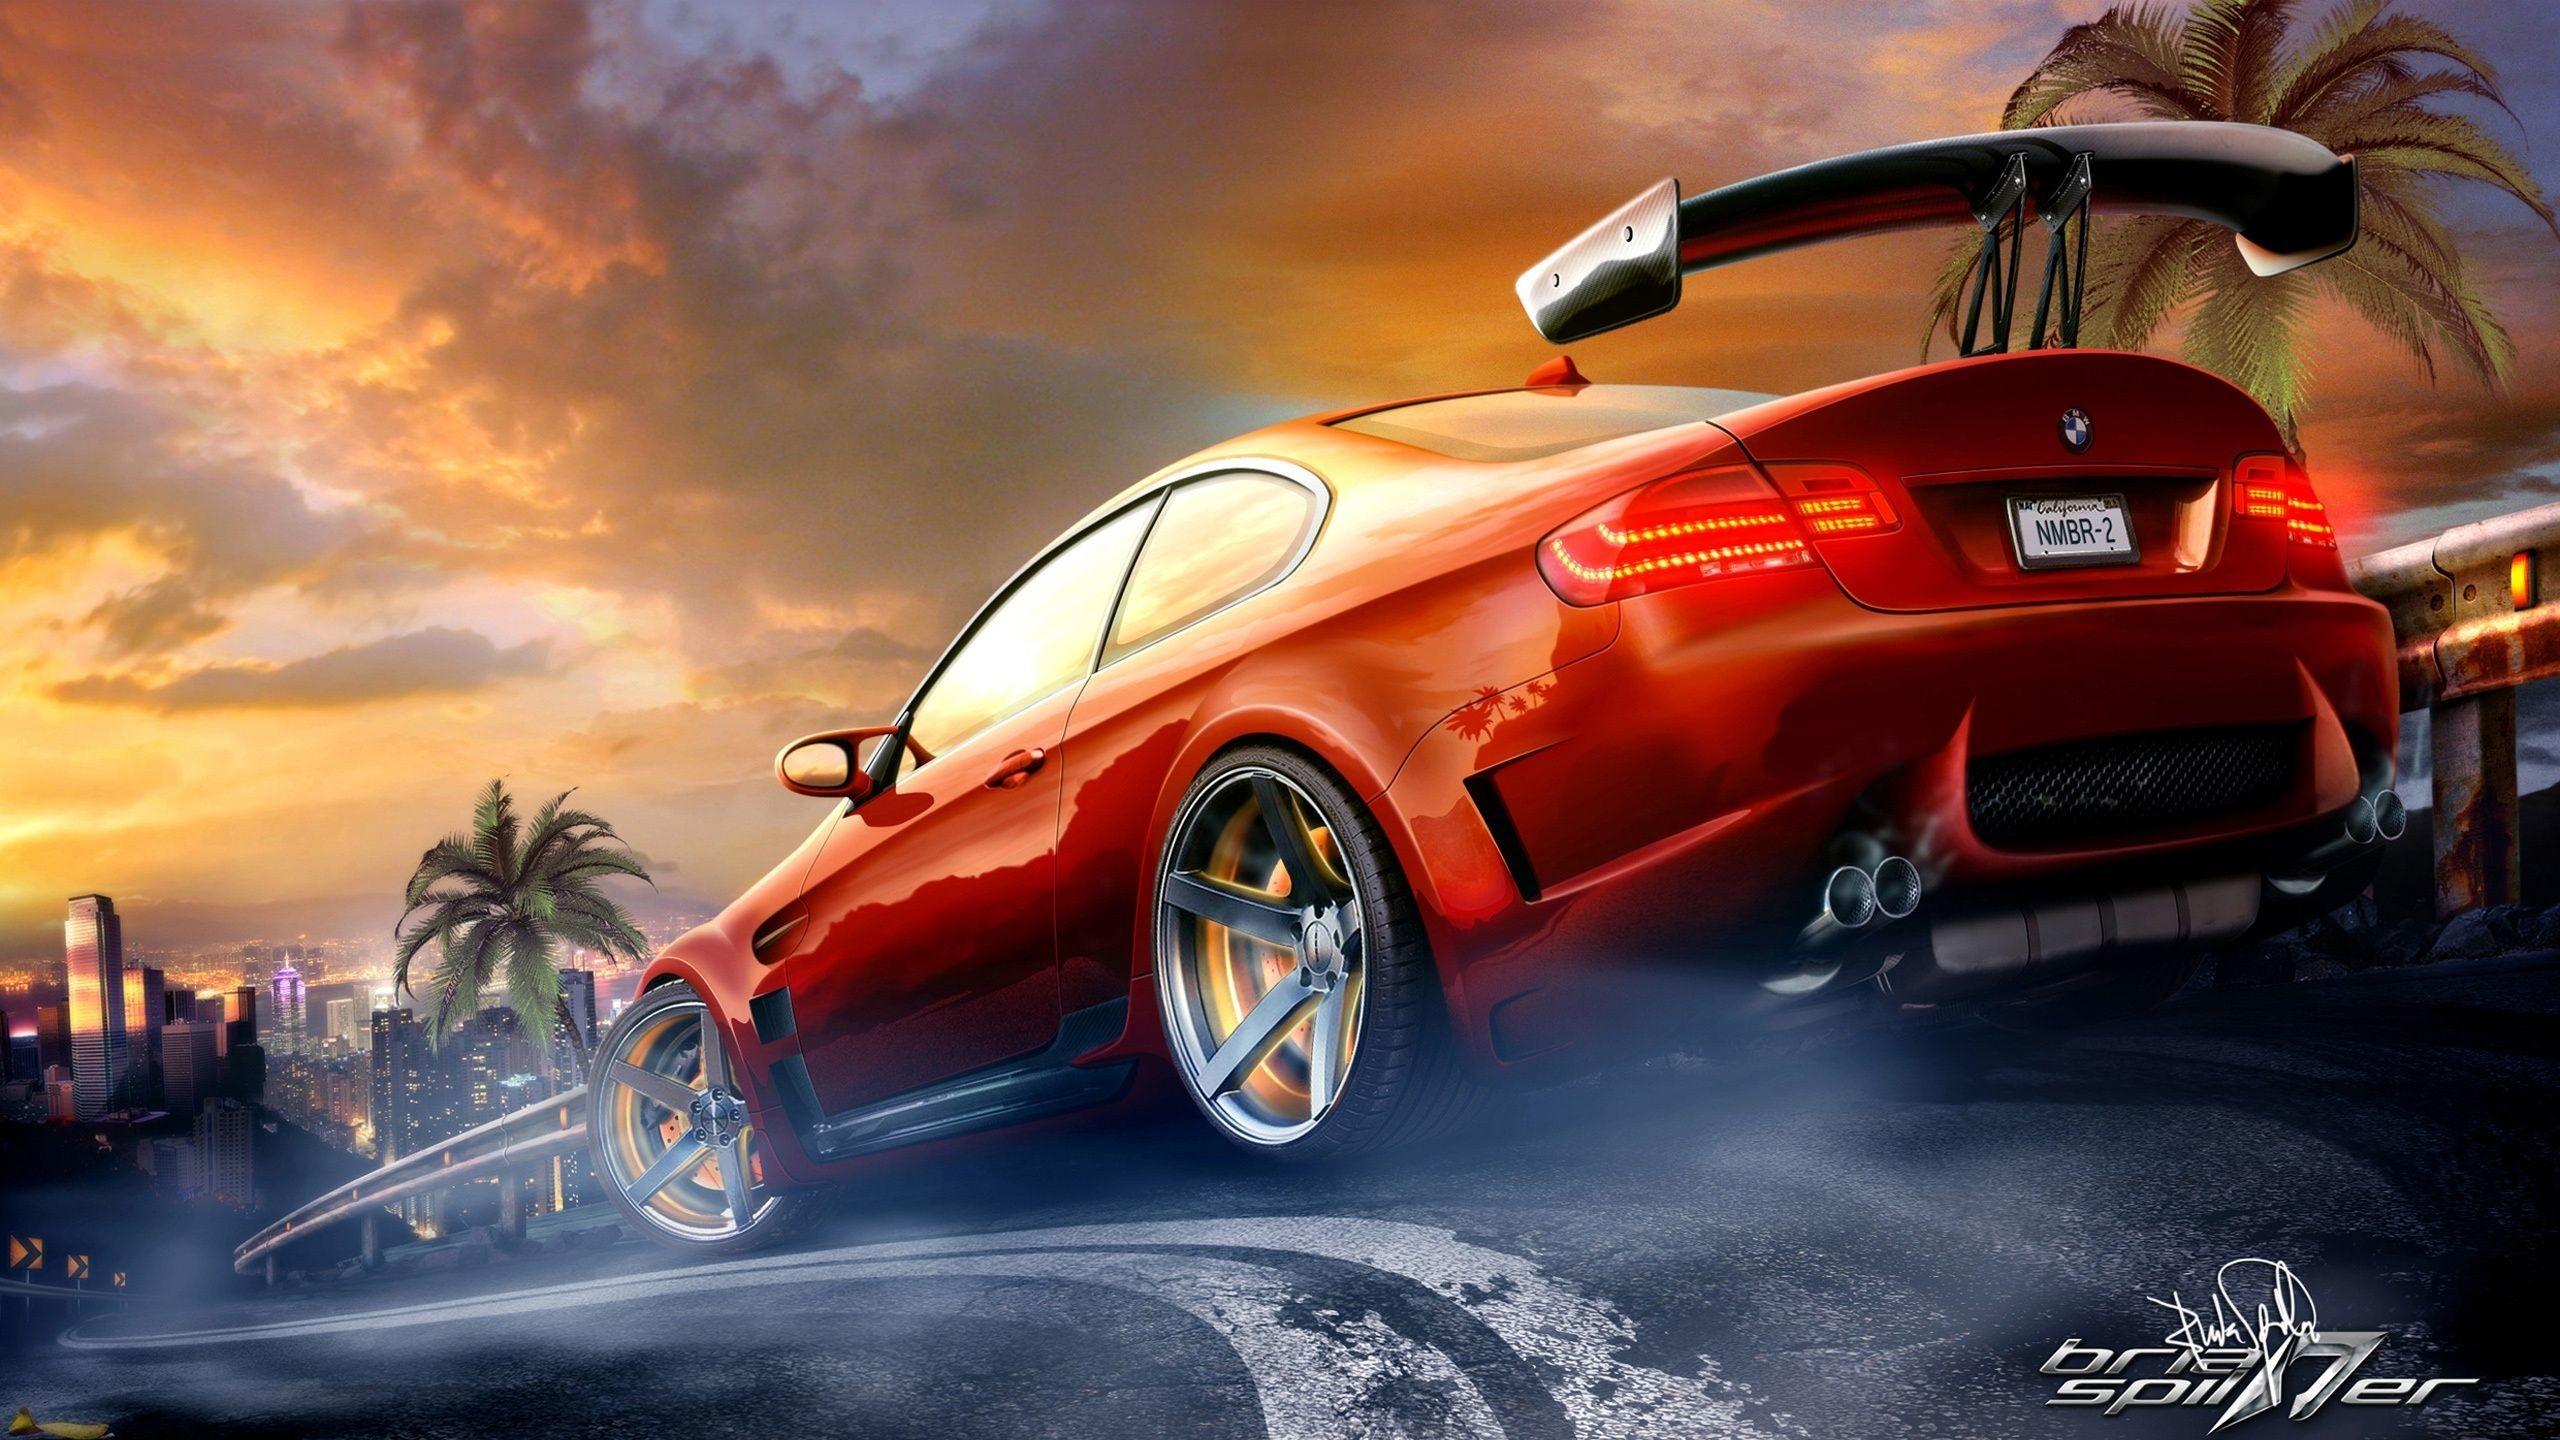 Res: 2560x1440, Street Racing Cars Wallpapers Desktop PC Sports Car Racing Wallpaper Hd